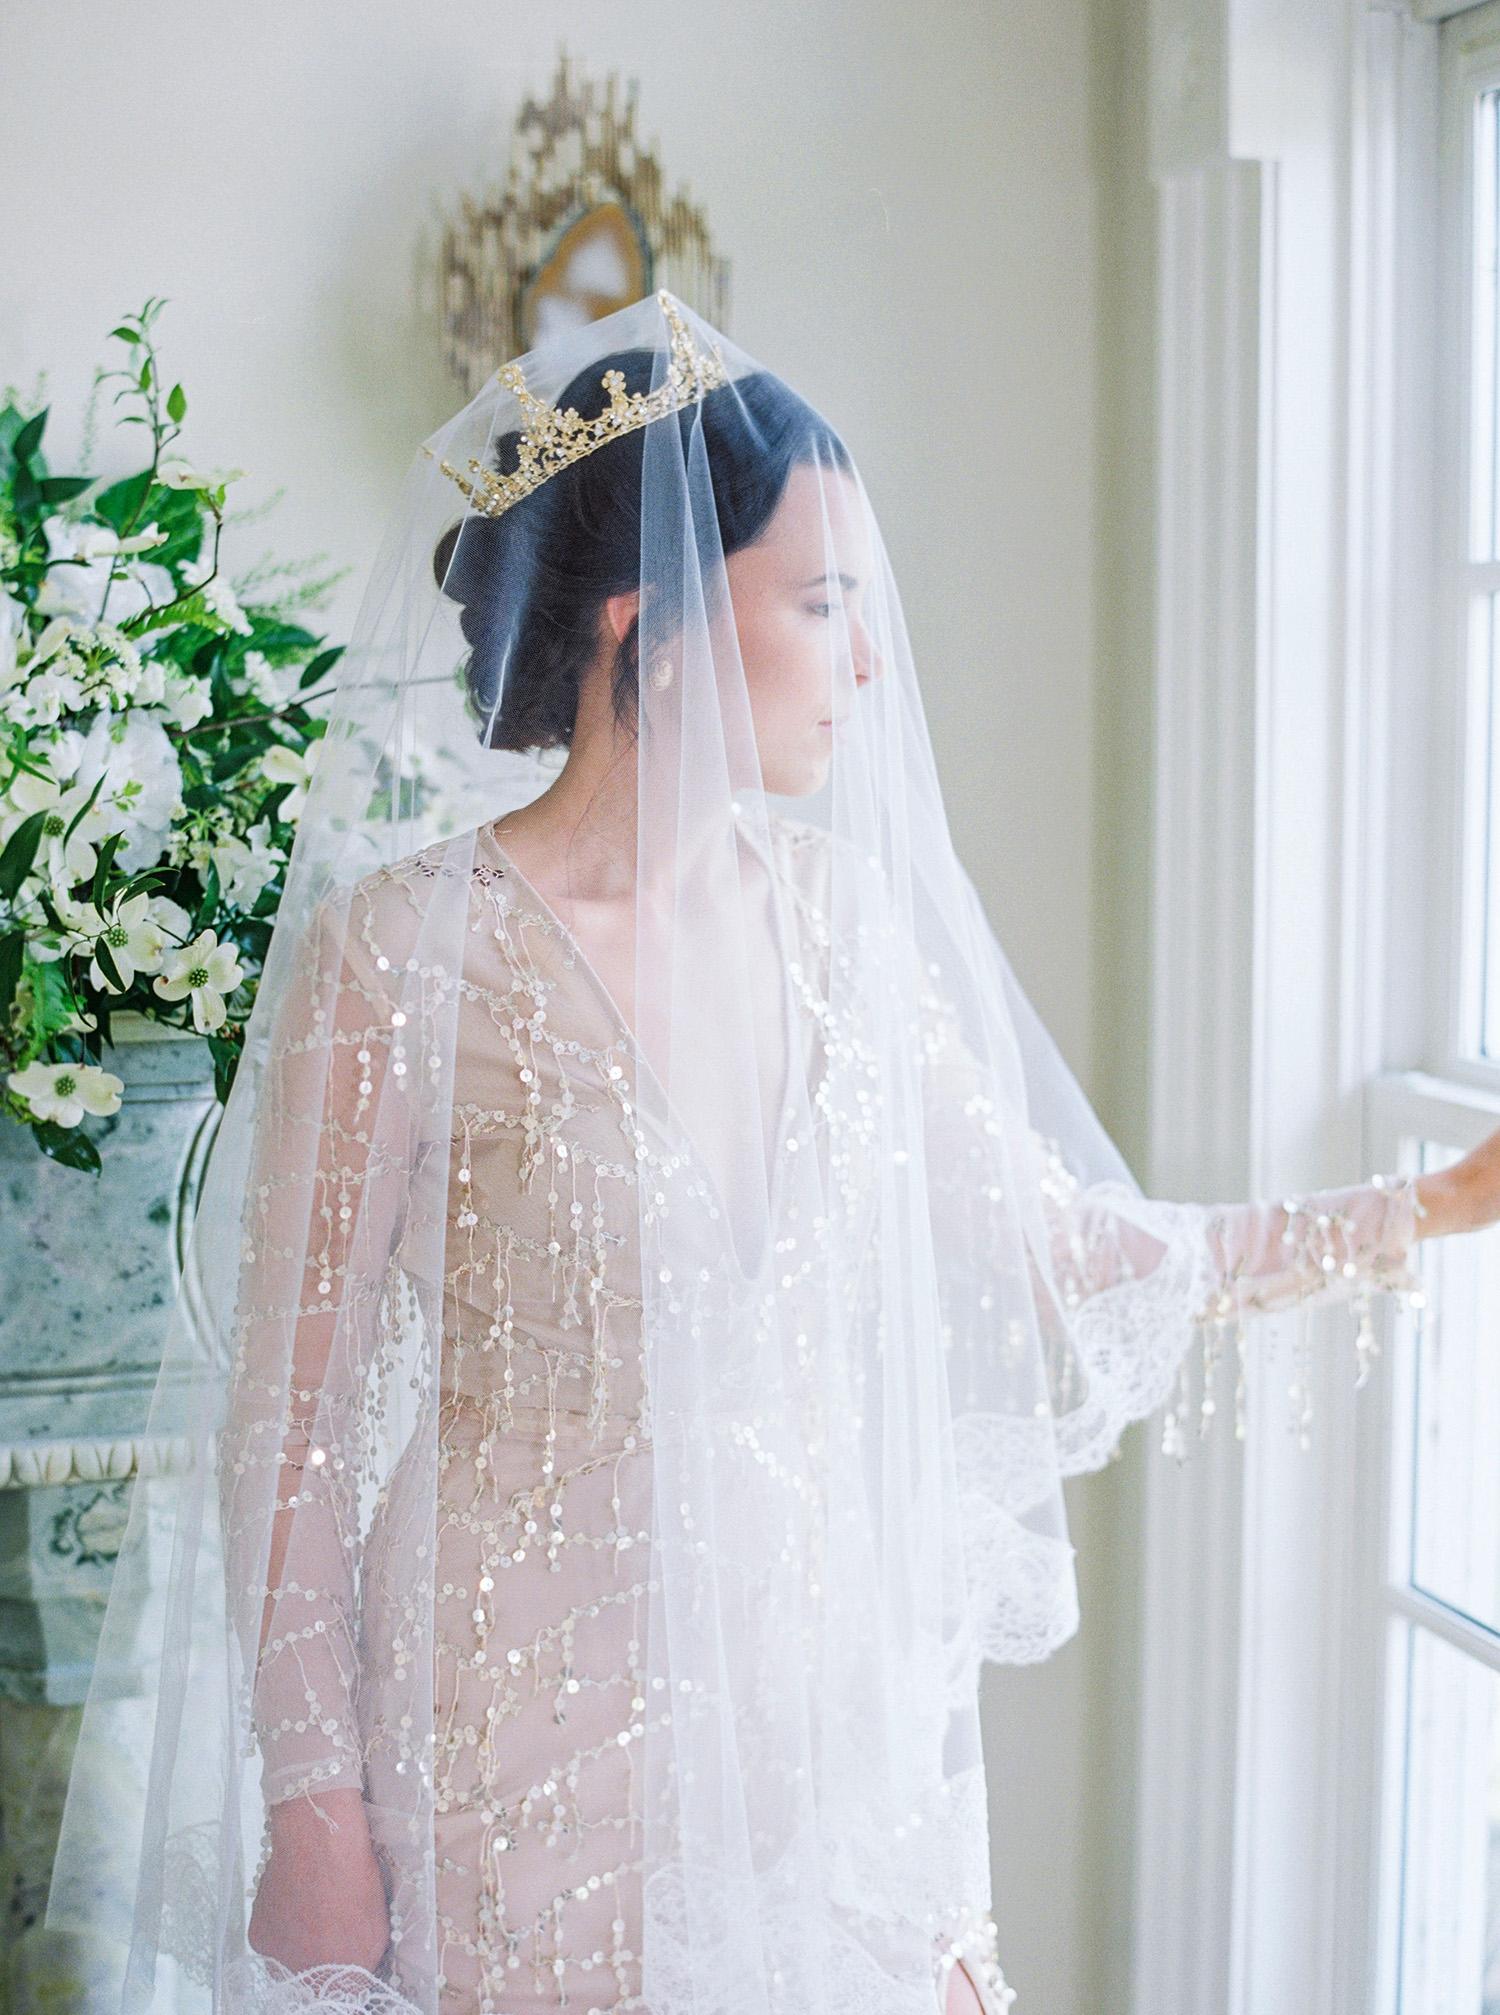 evan dustin vow renewal bride with veil and crown